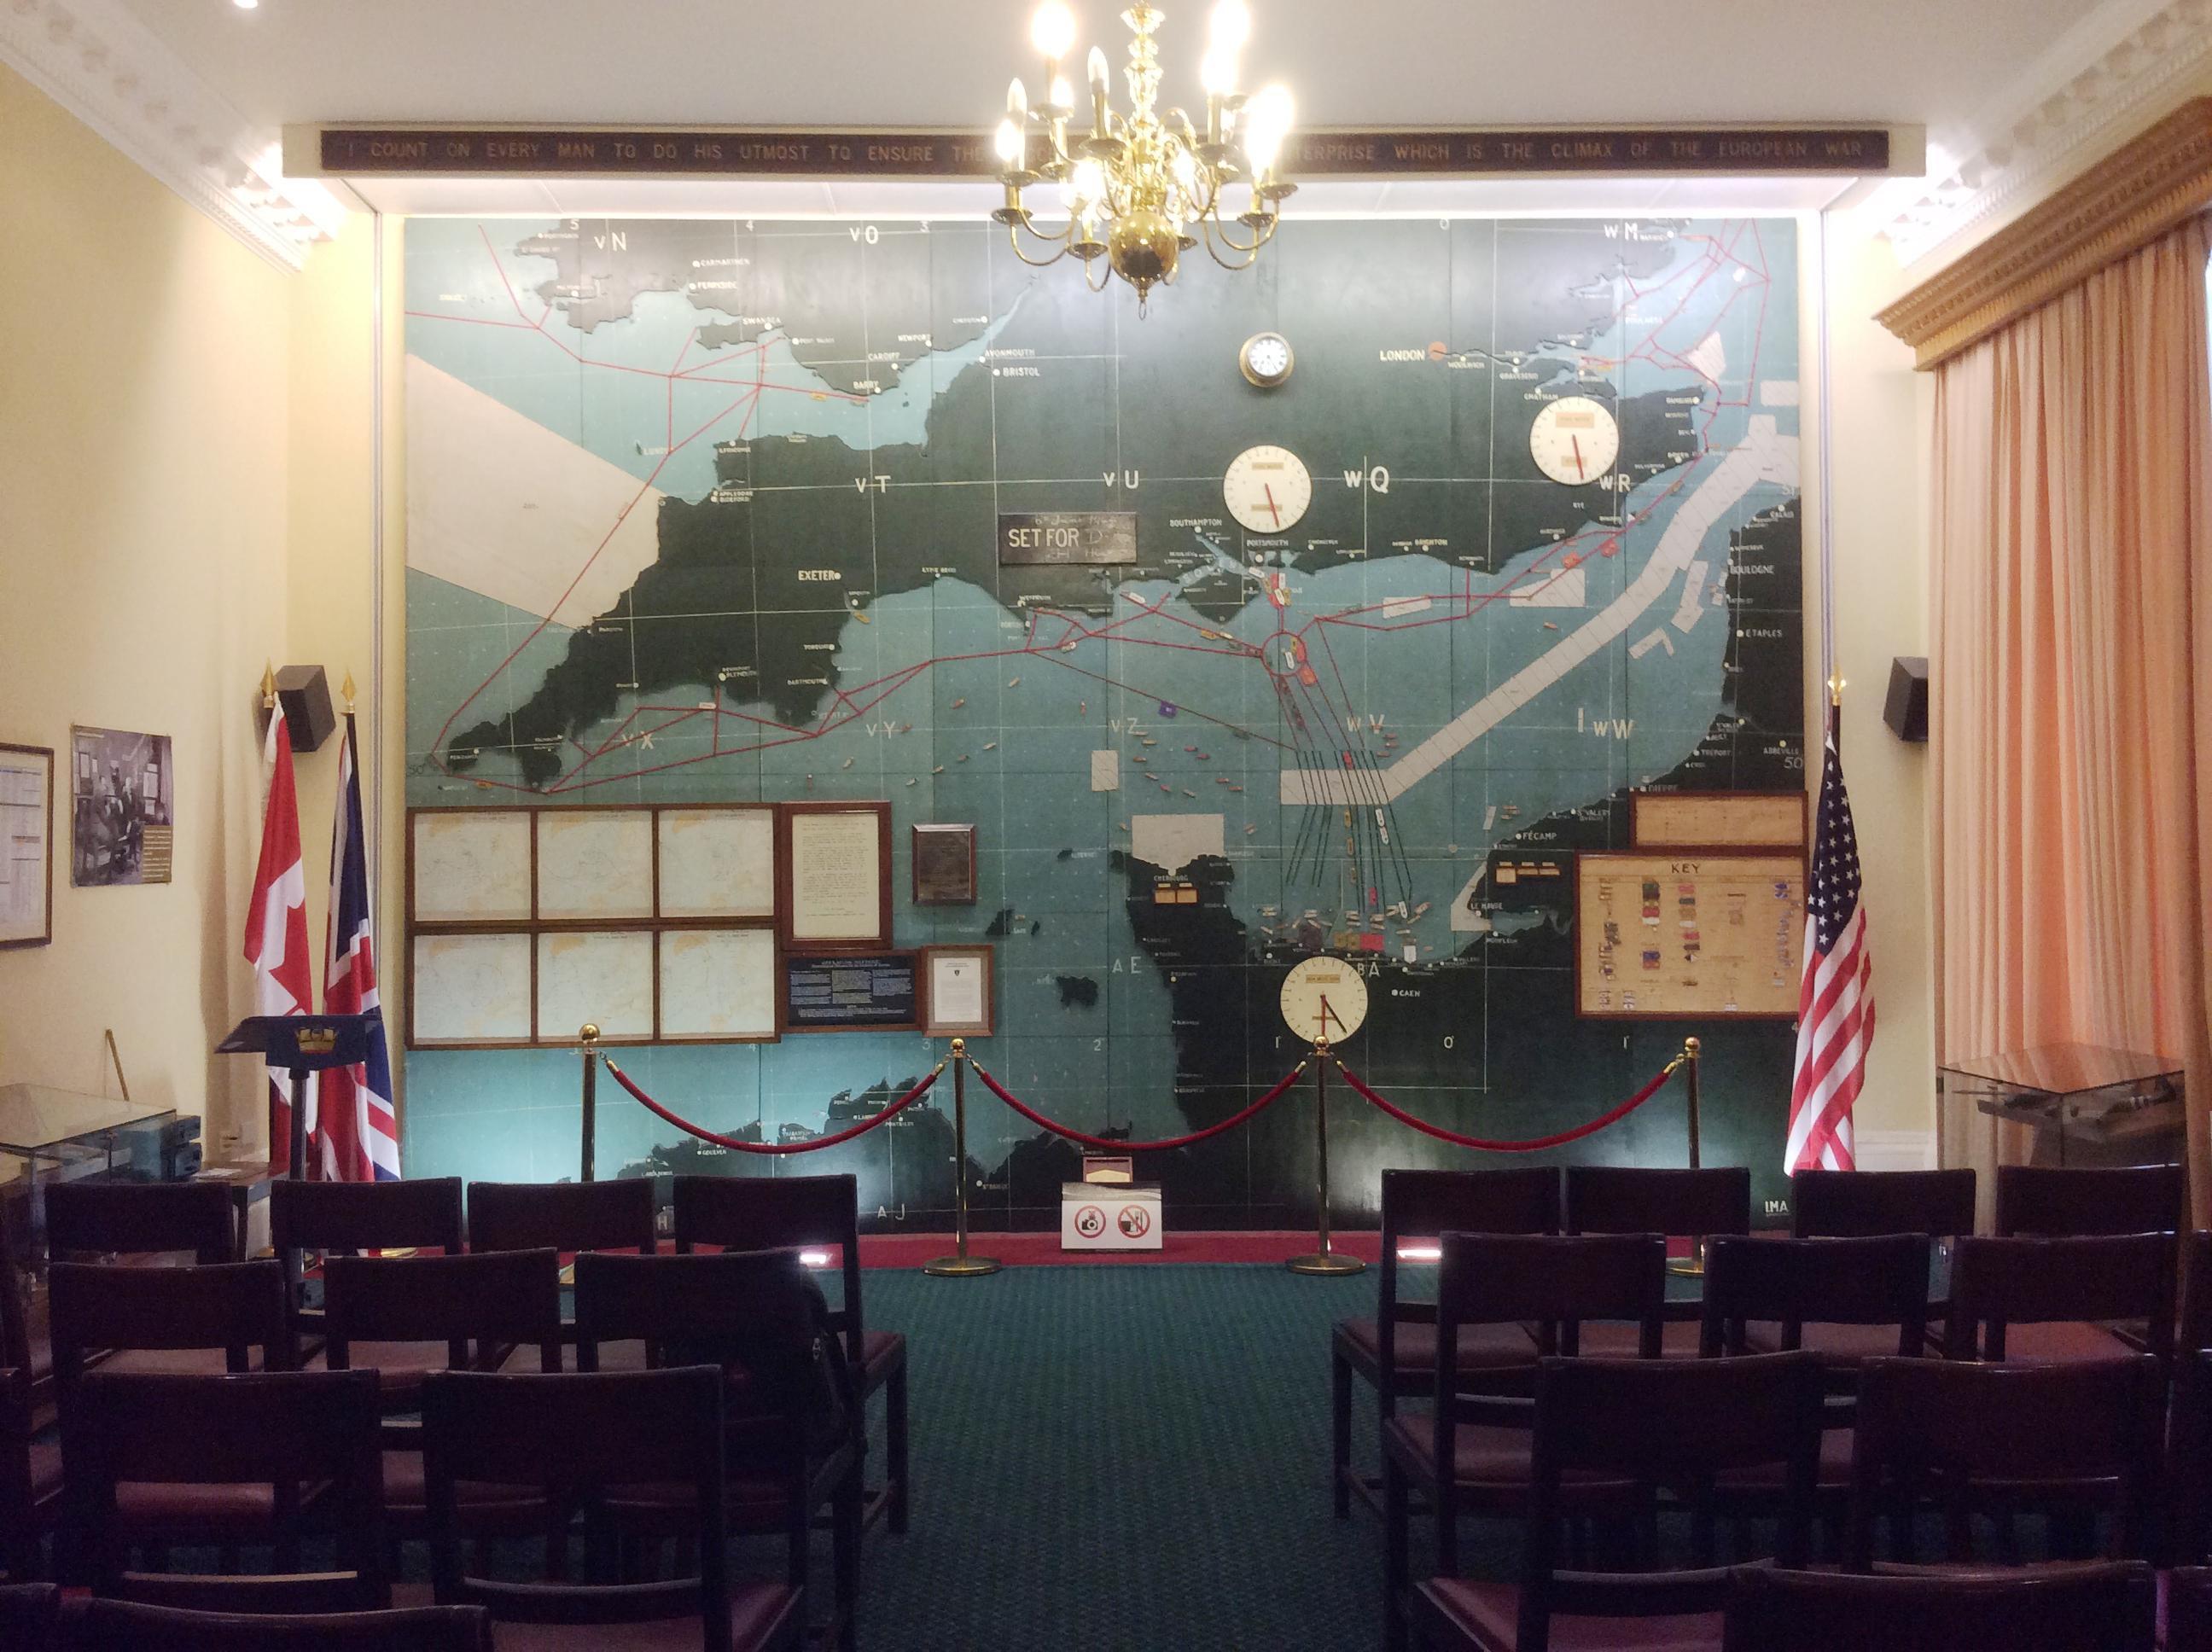 Dday map background Southwick house.jpg